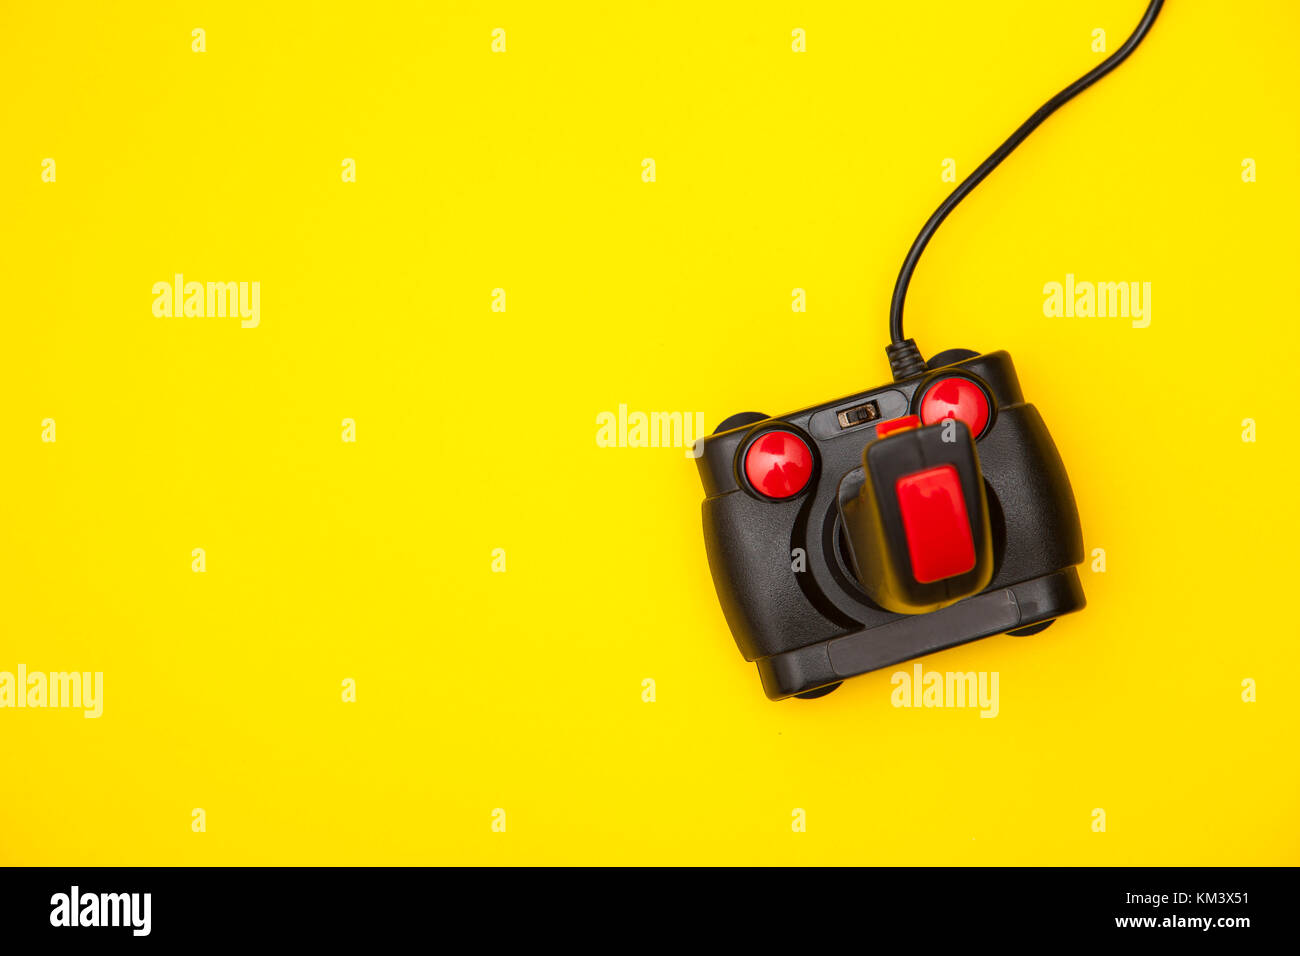 Image Result For Yellow Gaming Logoa